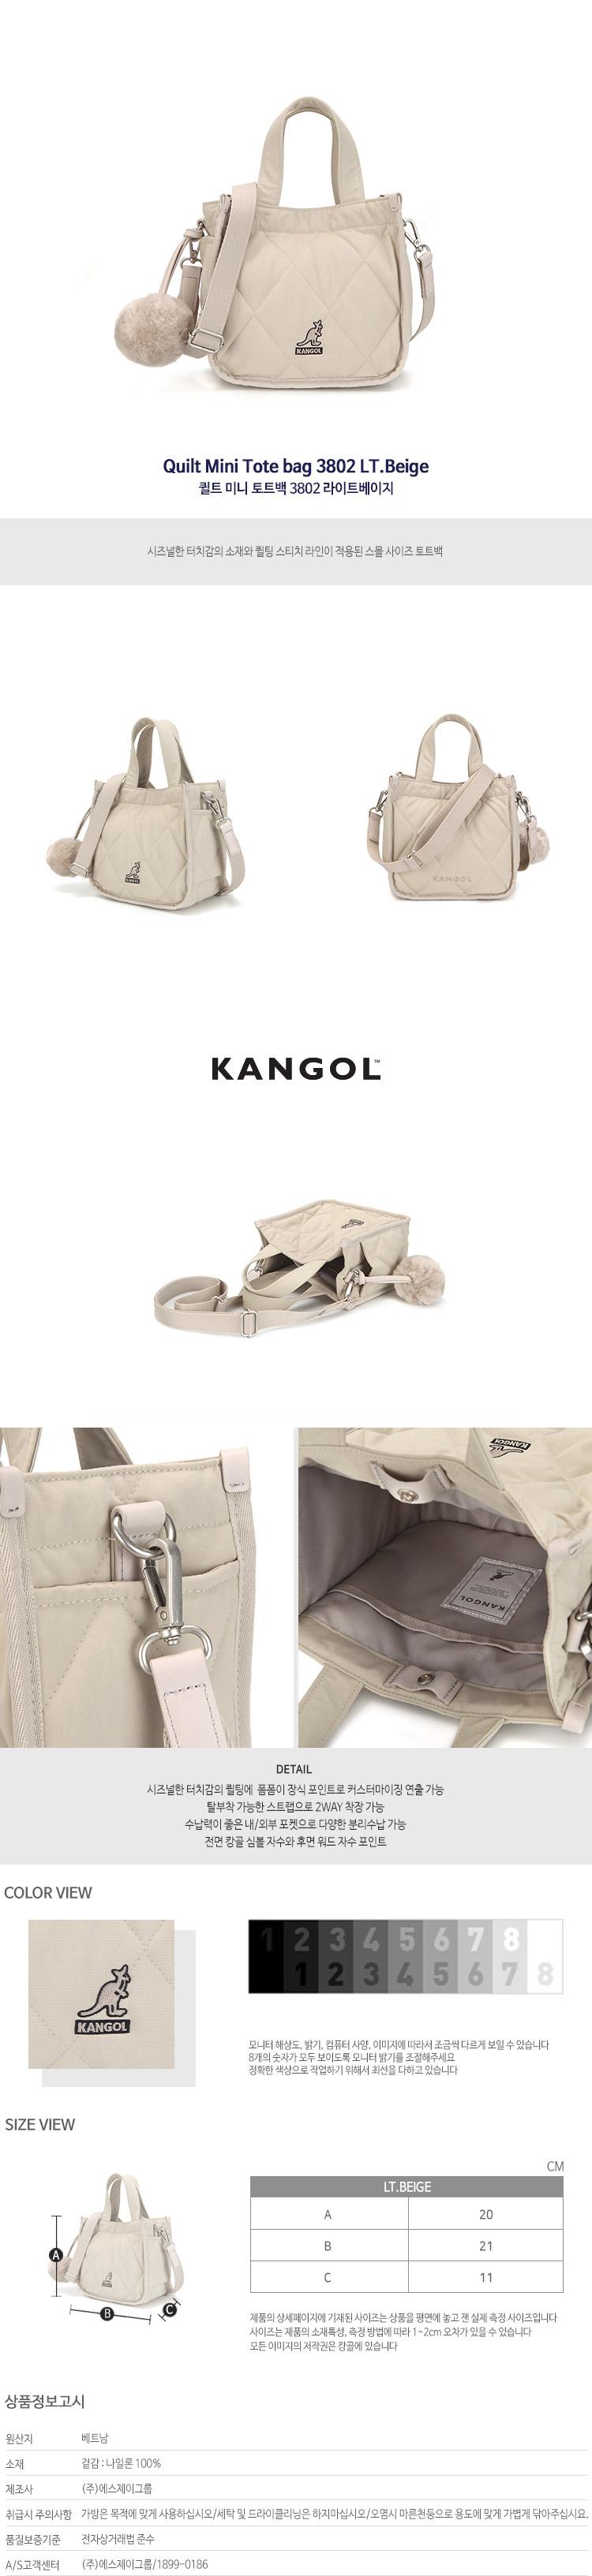 Quilt Mini Tote bag 3802 LT.BEIGE